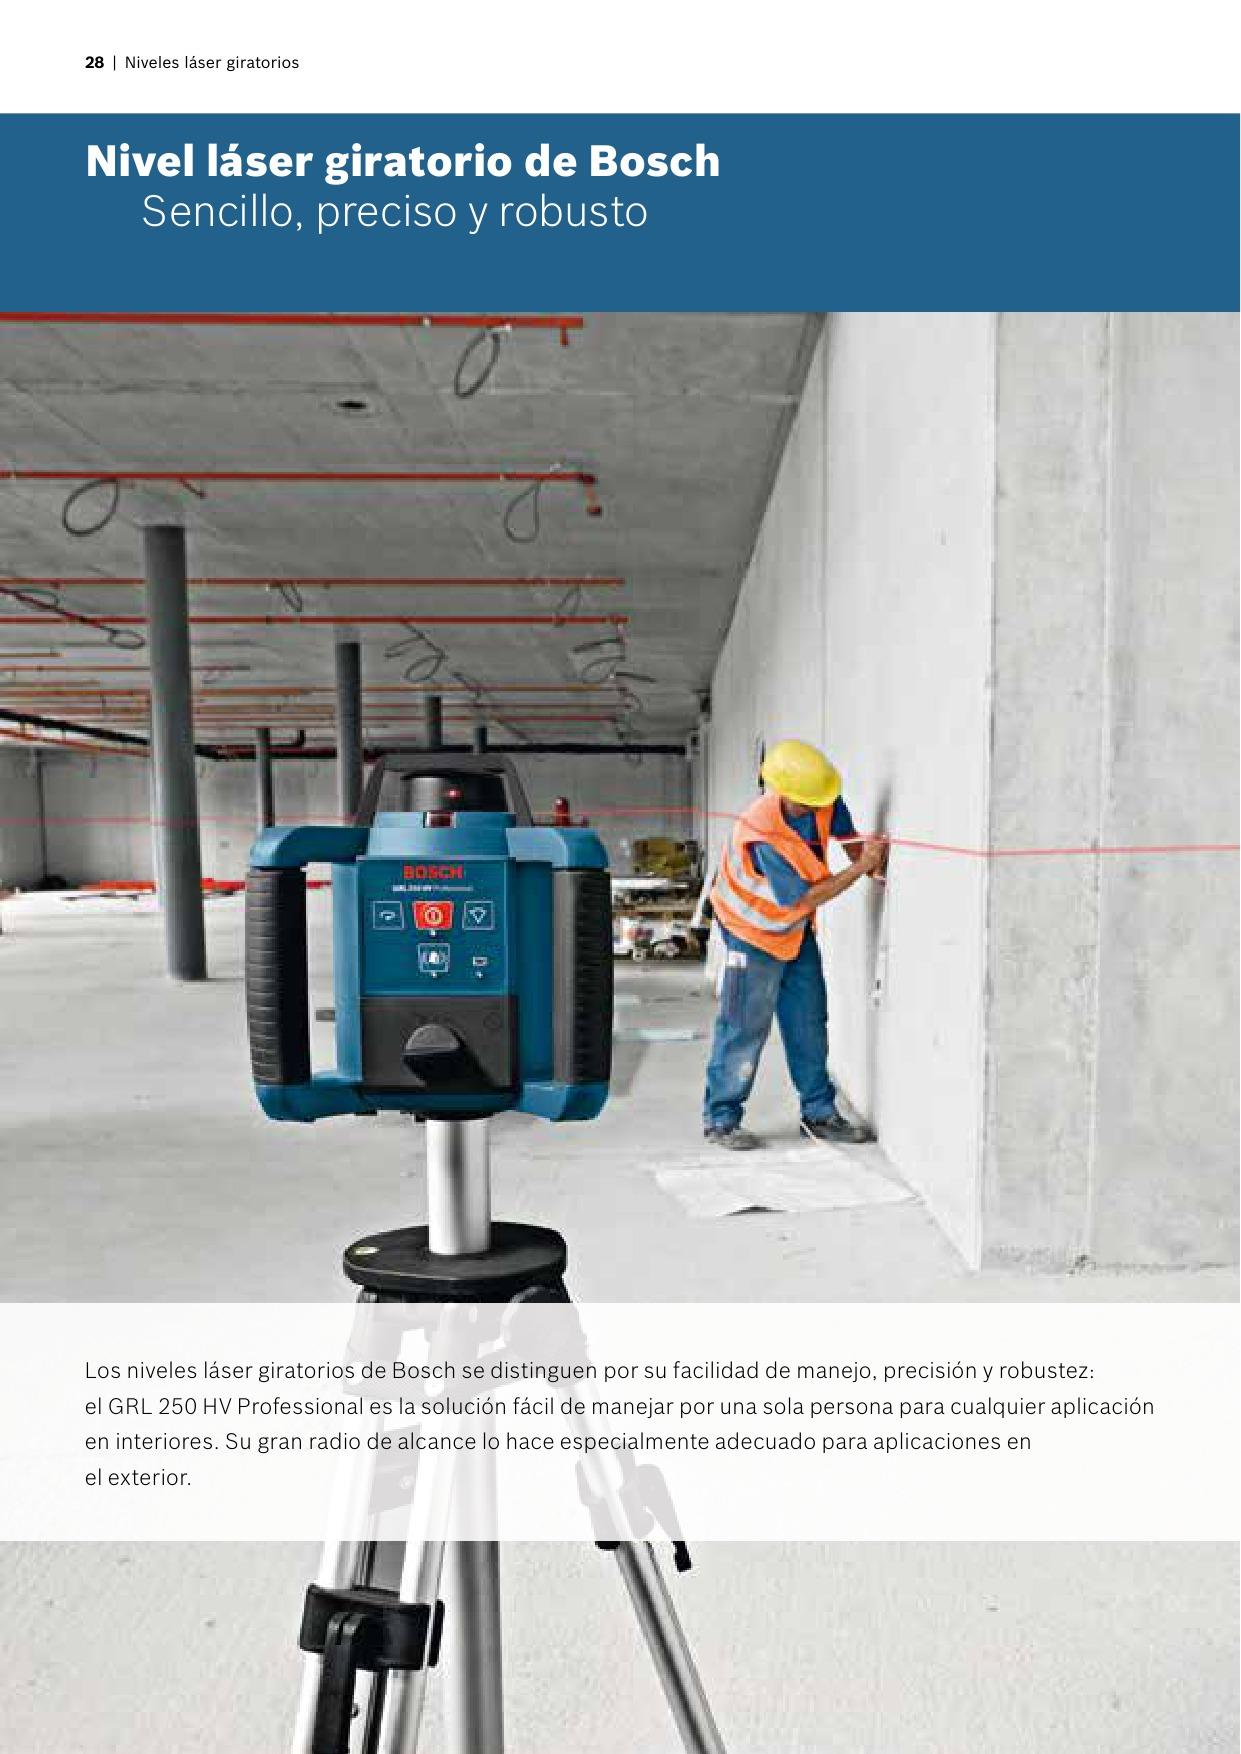 Catalogo-Tecnico-de-Herramientas-de-Medicion-2014-Bosch-Nivel-Laser-Giratorio